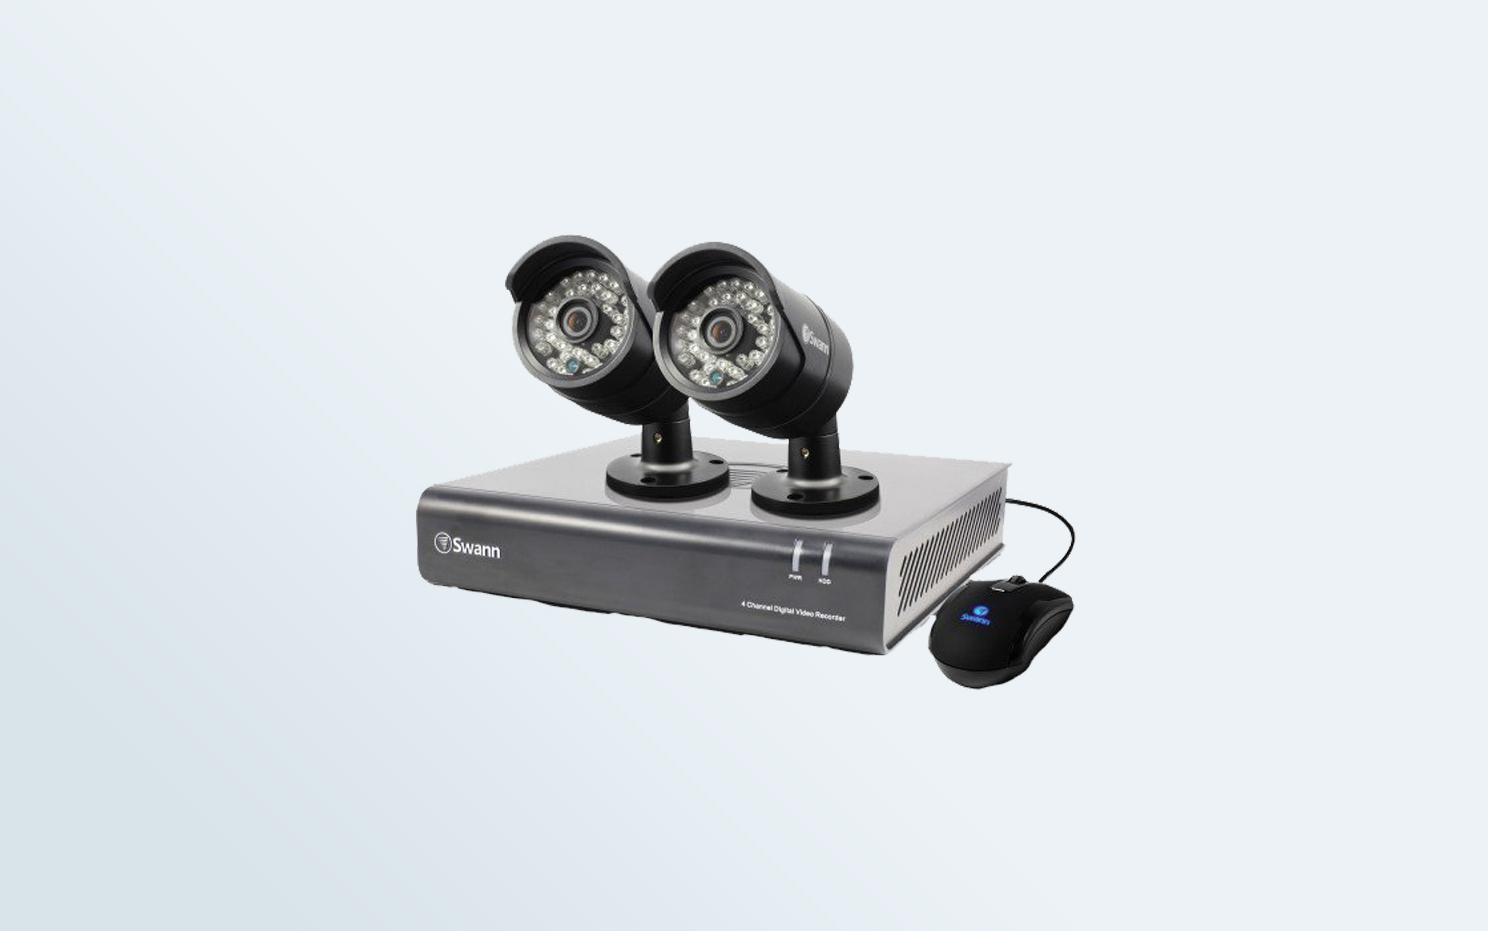 Best Home Surveillance Systems of 2019 | Top Ten Reviews